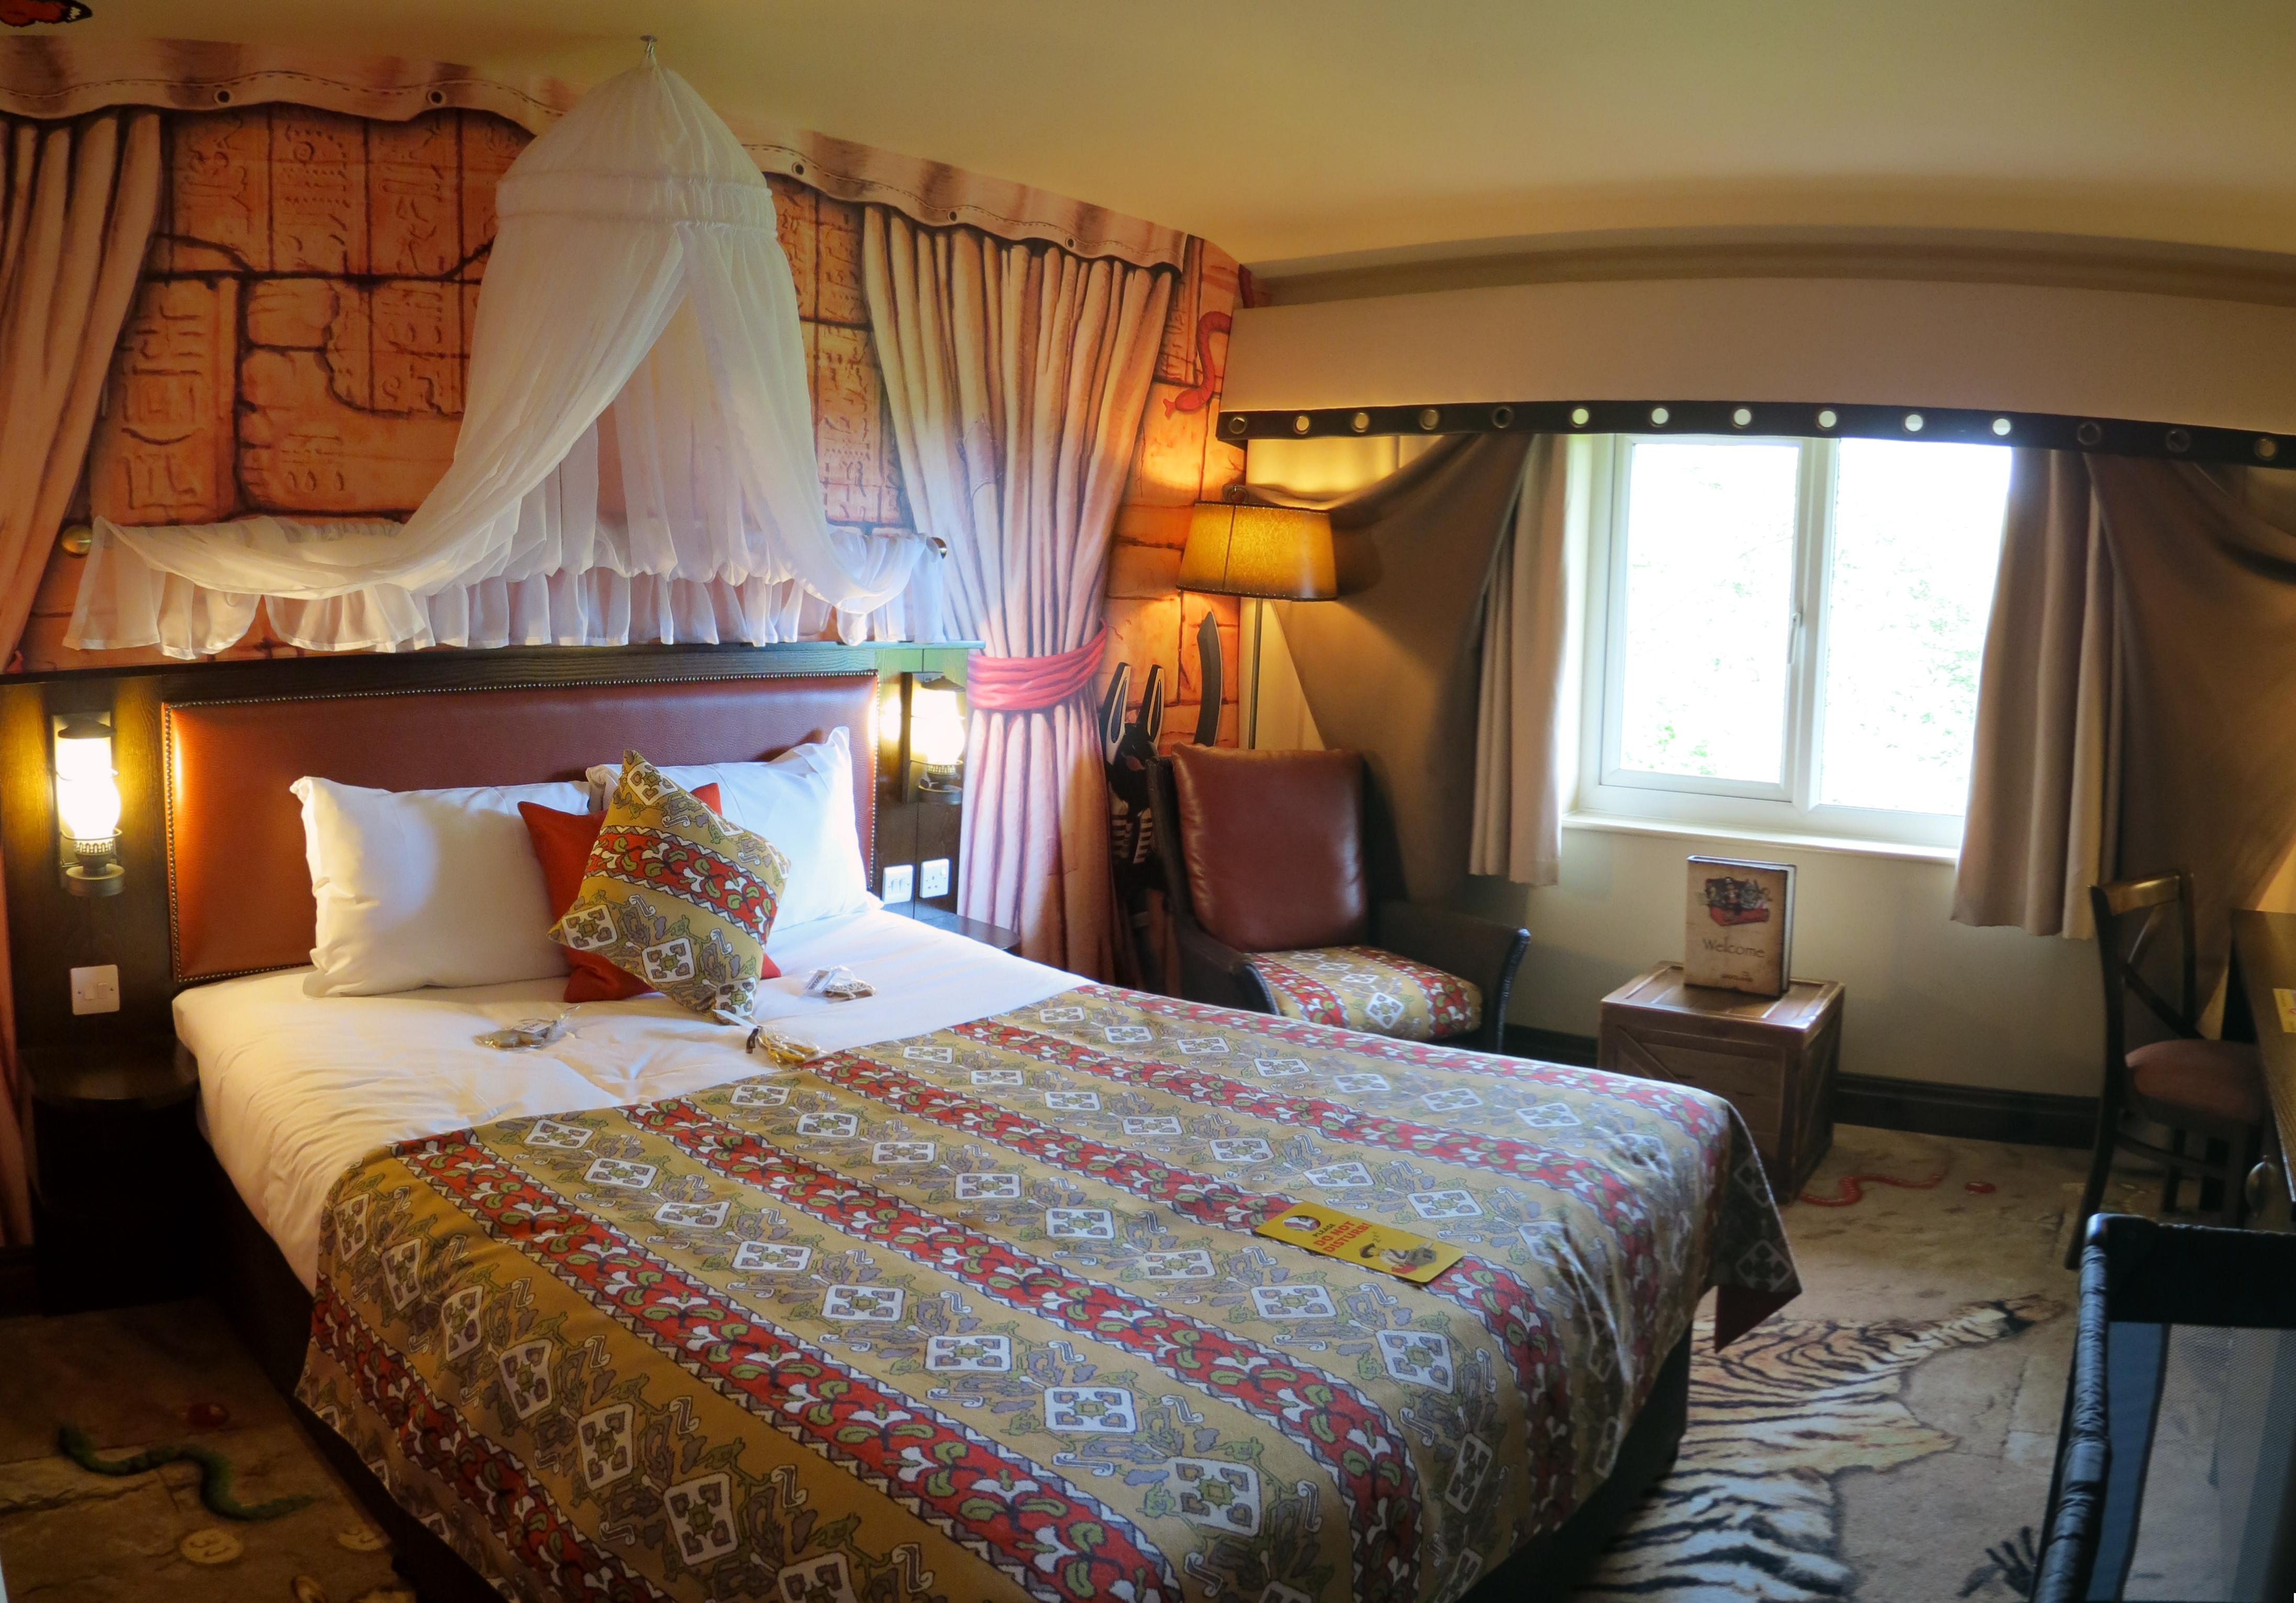 A Quick Look Inside An Adventurer Premium Themed Room At